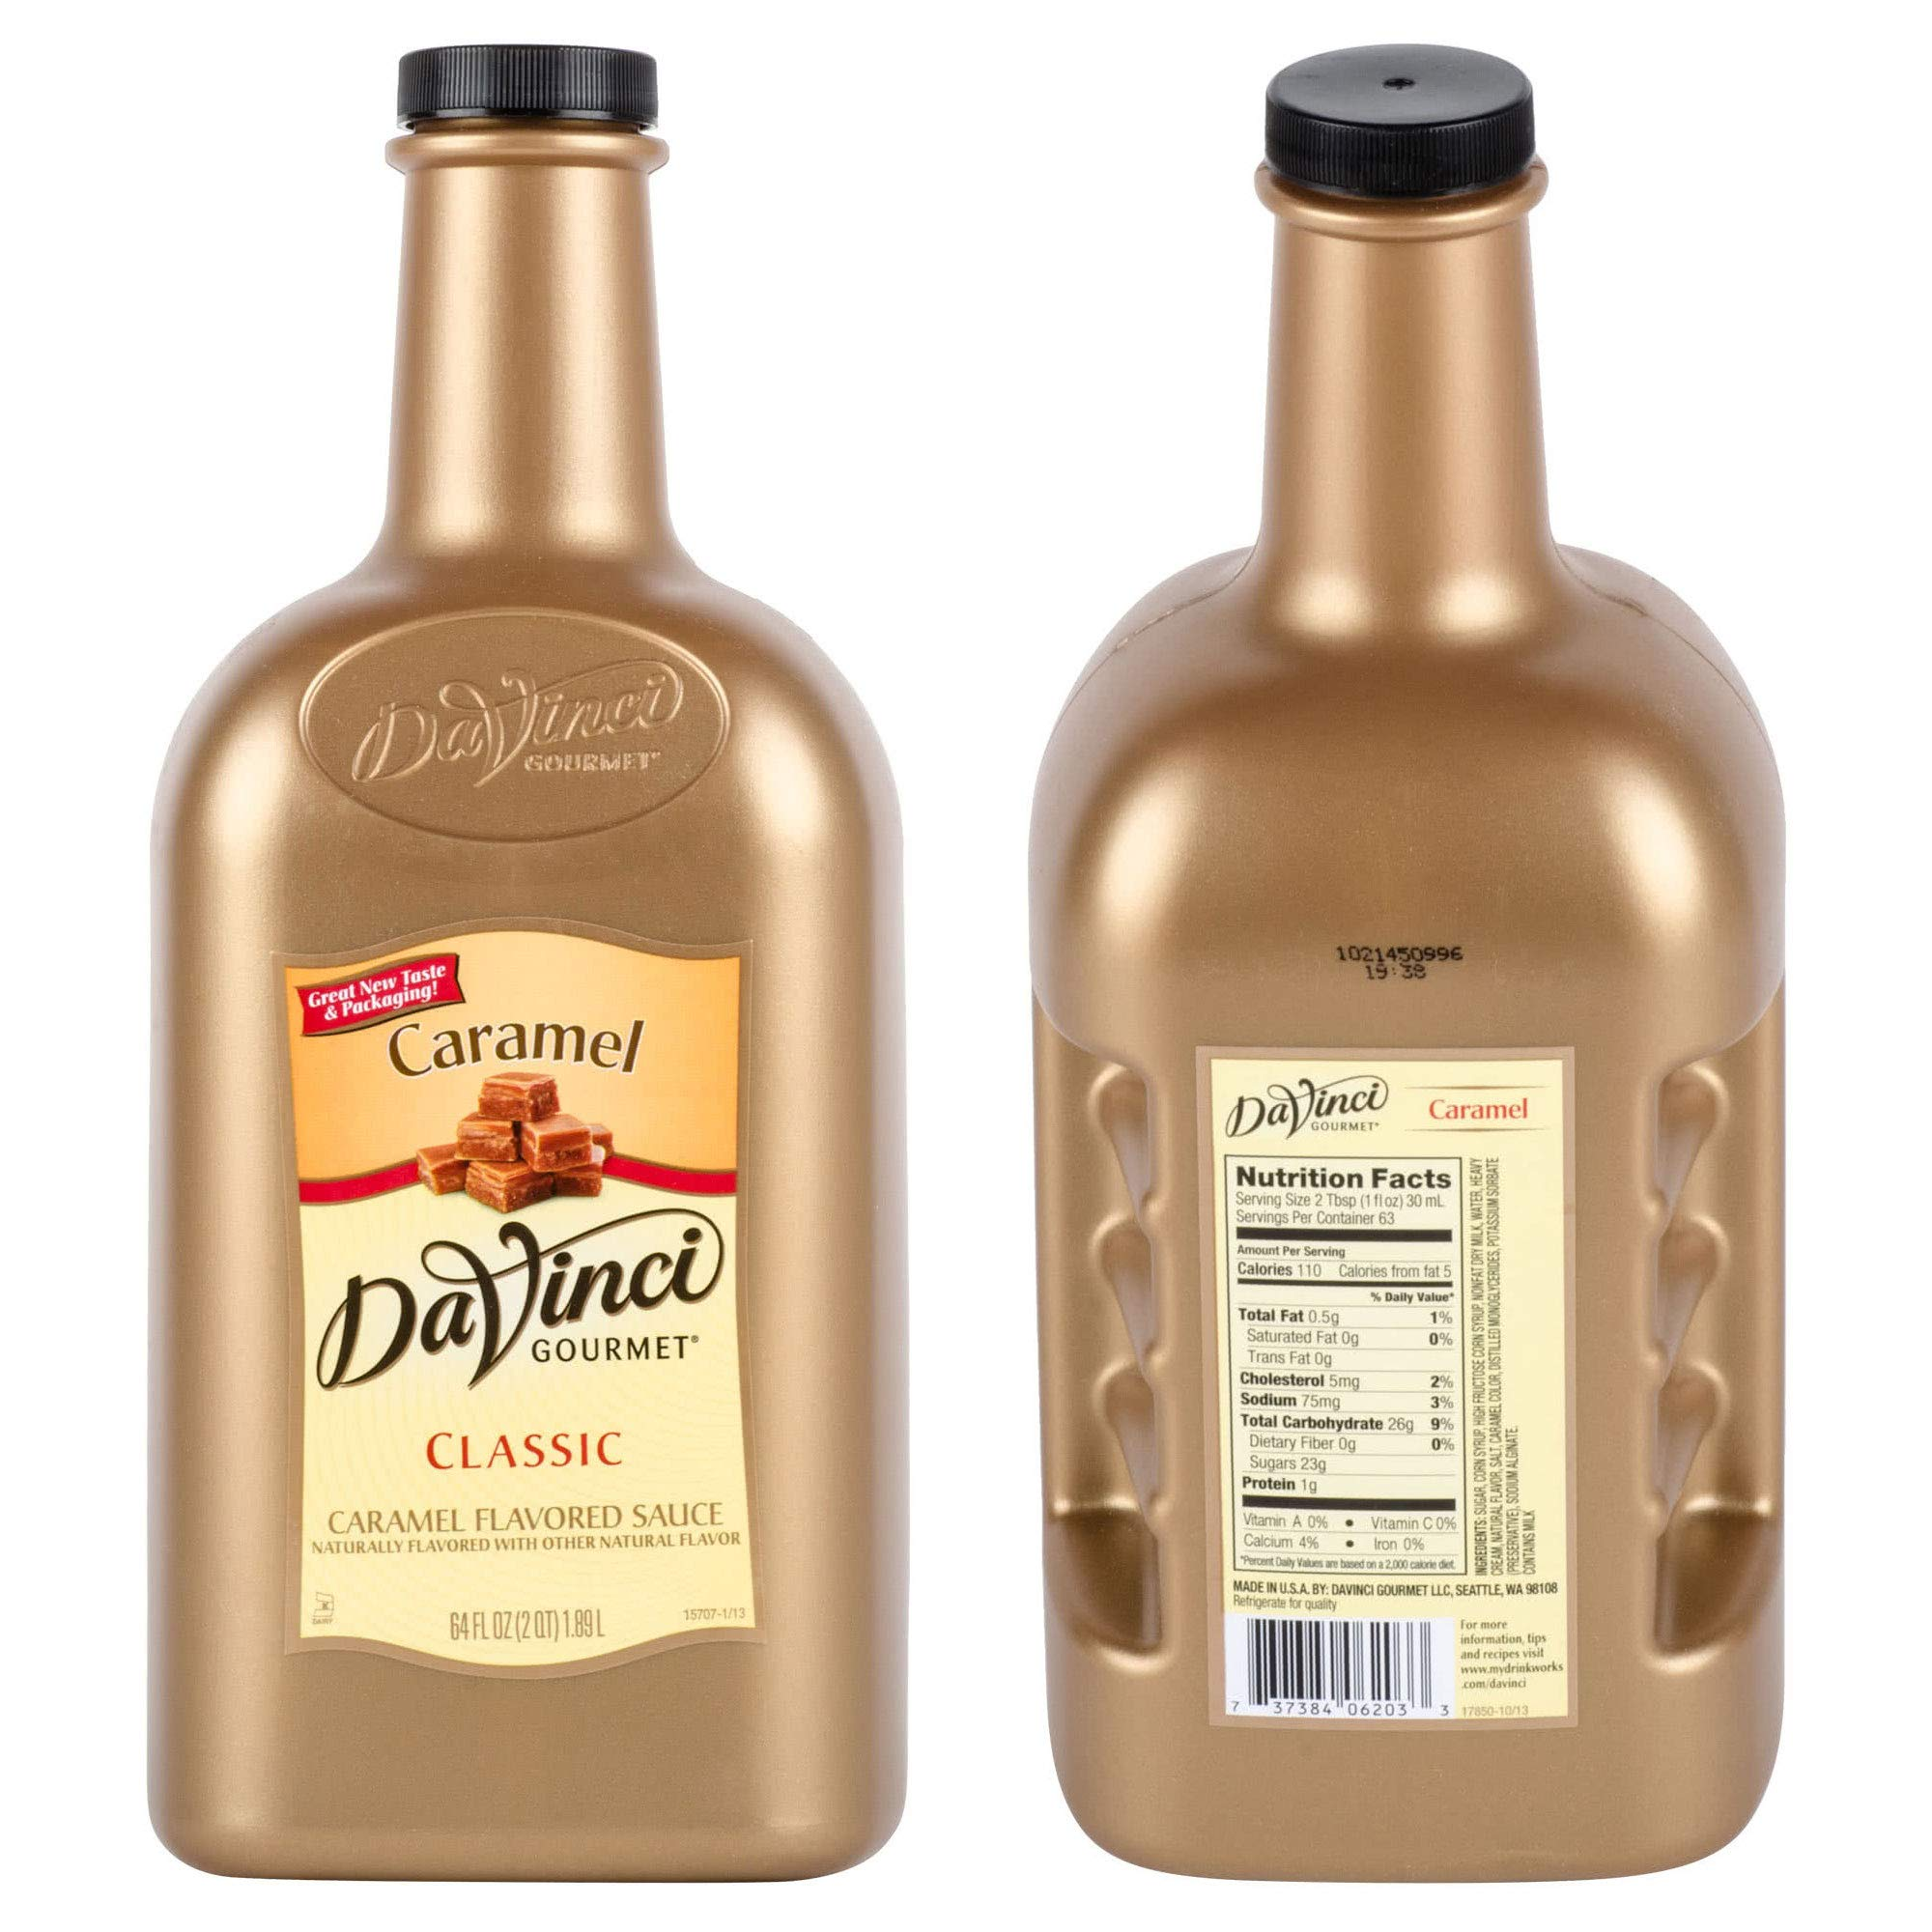 BWS 6 Bottles 64-Ounce DaVinci Gourmet Caramel Flavoring Sauces